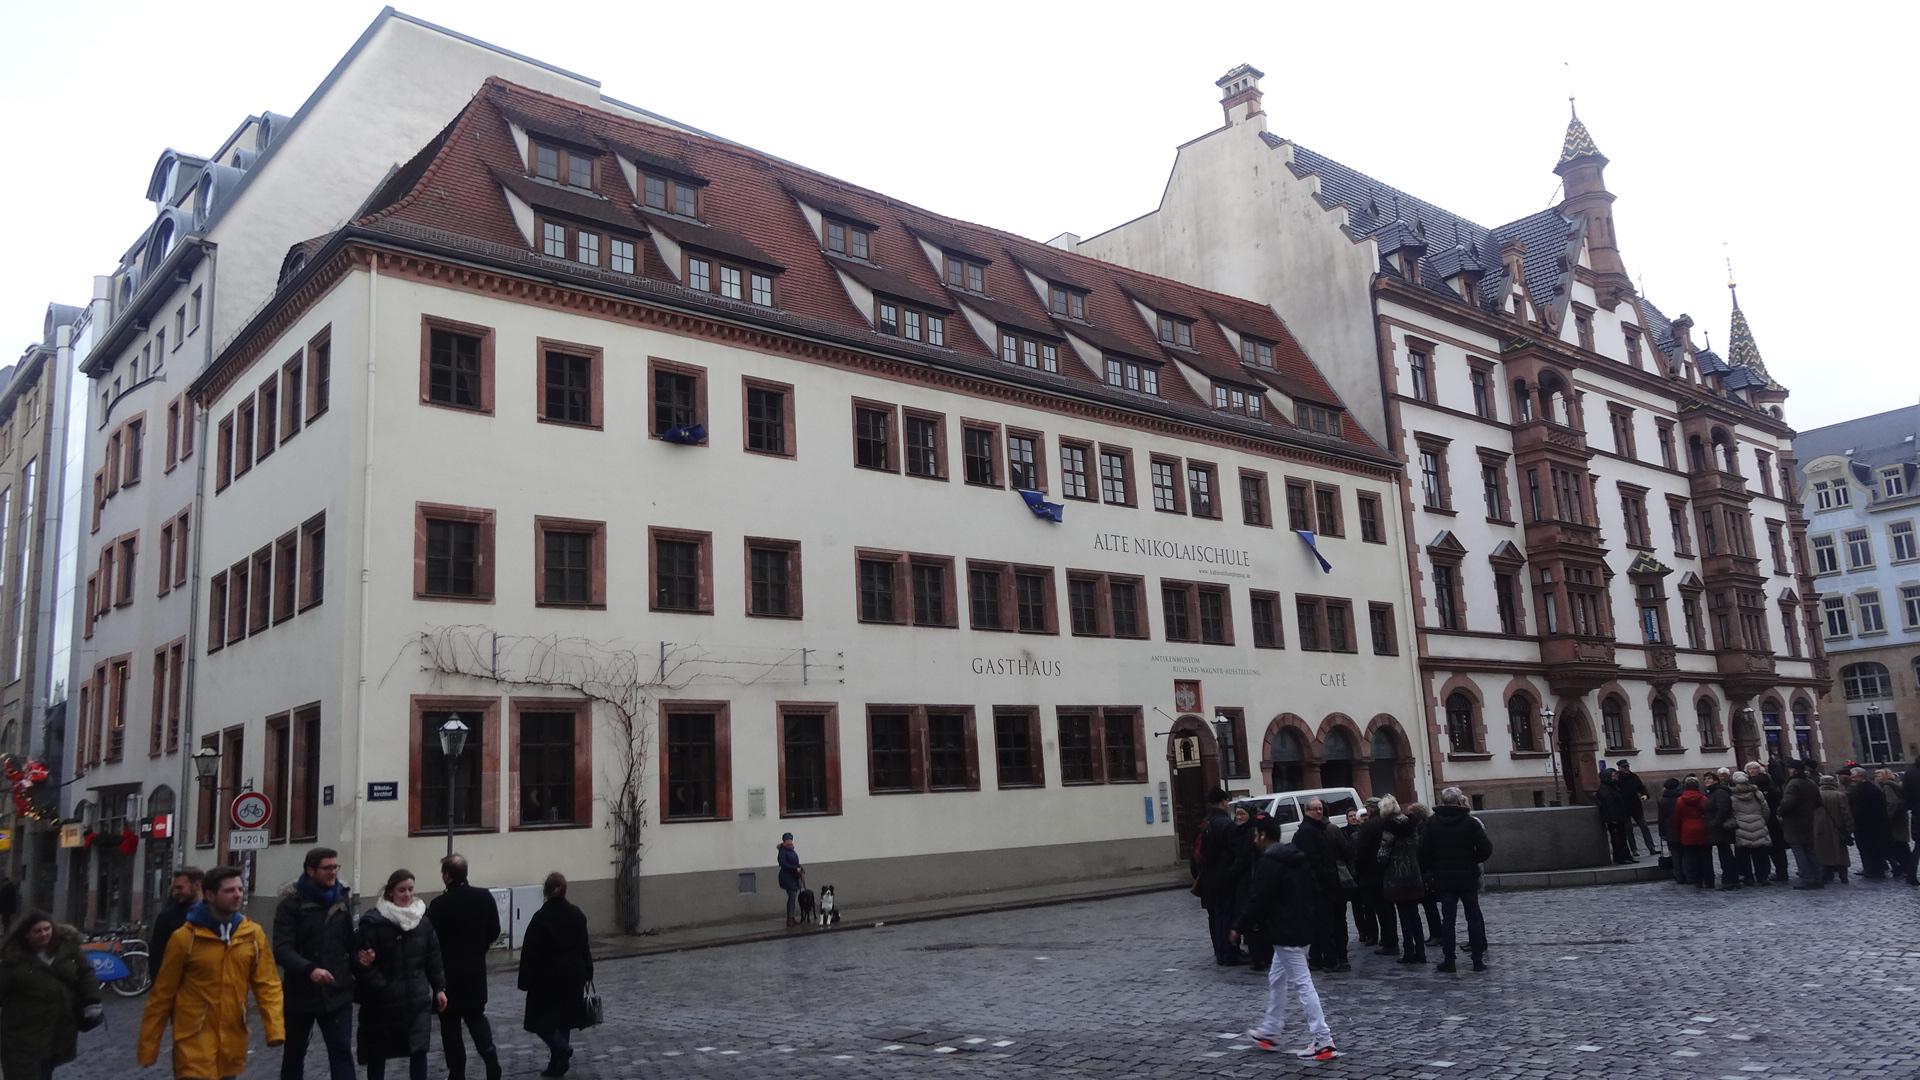 Old St. Nicholas's School